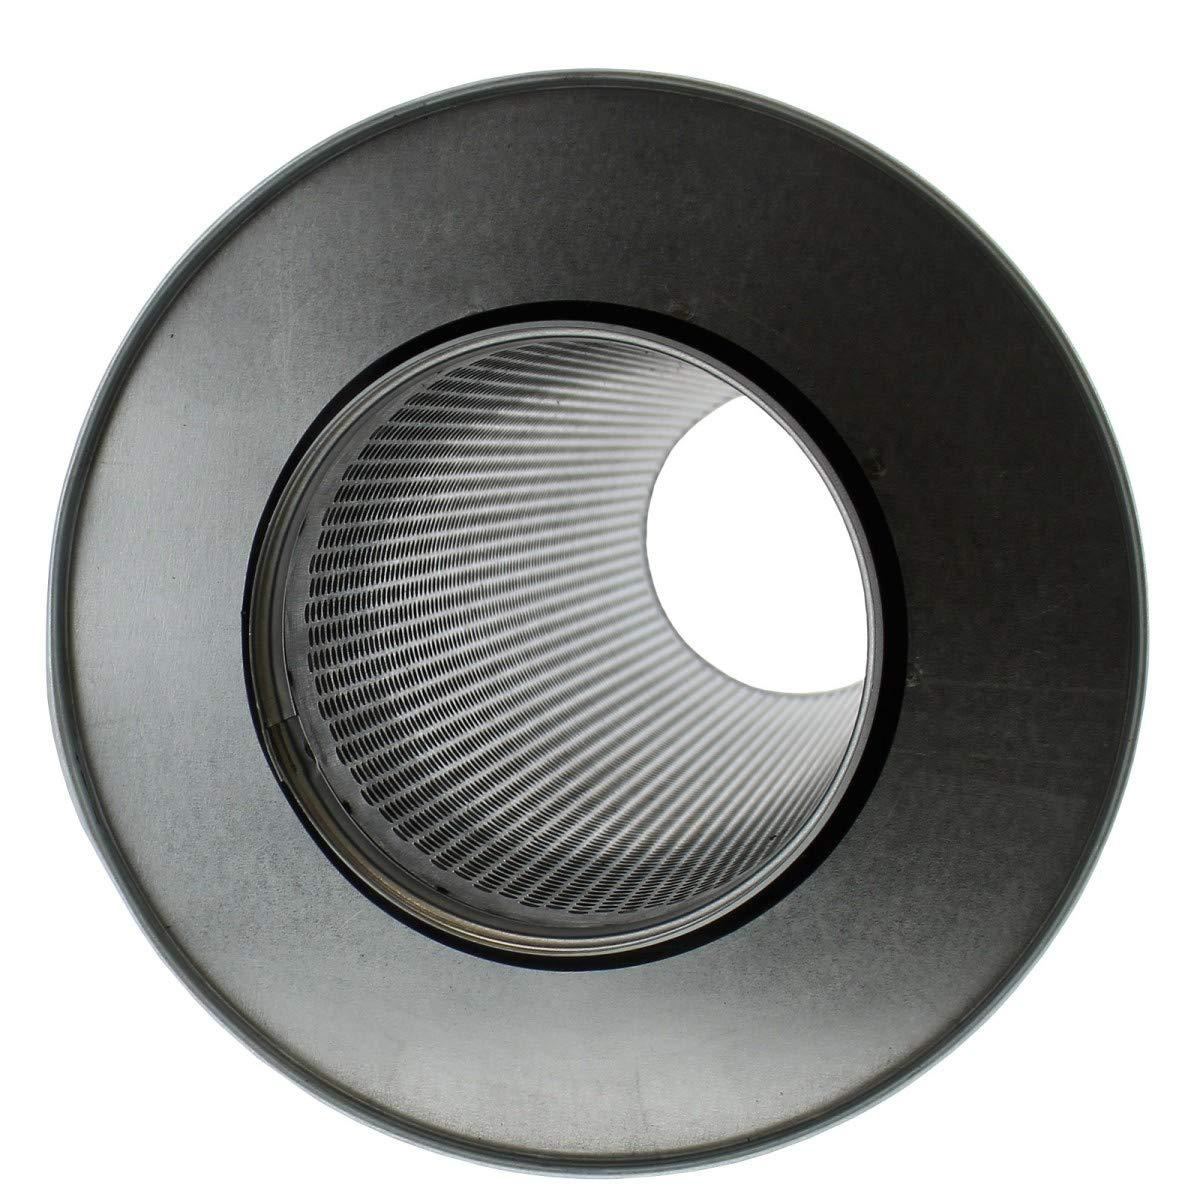 Diam/ètre 125mm Silencieux rigide